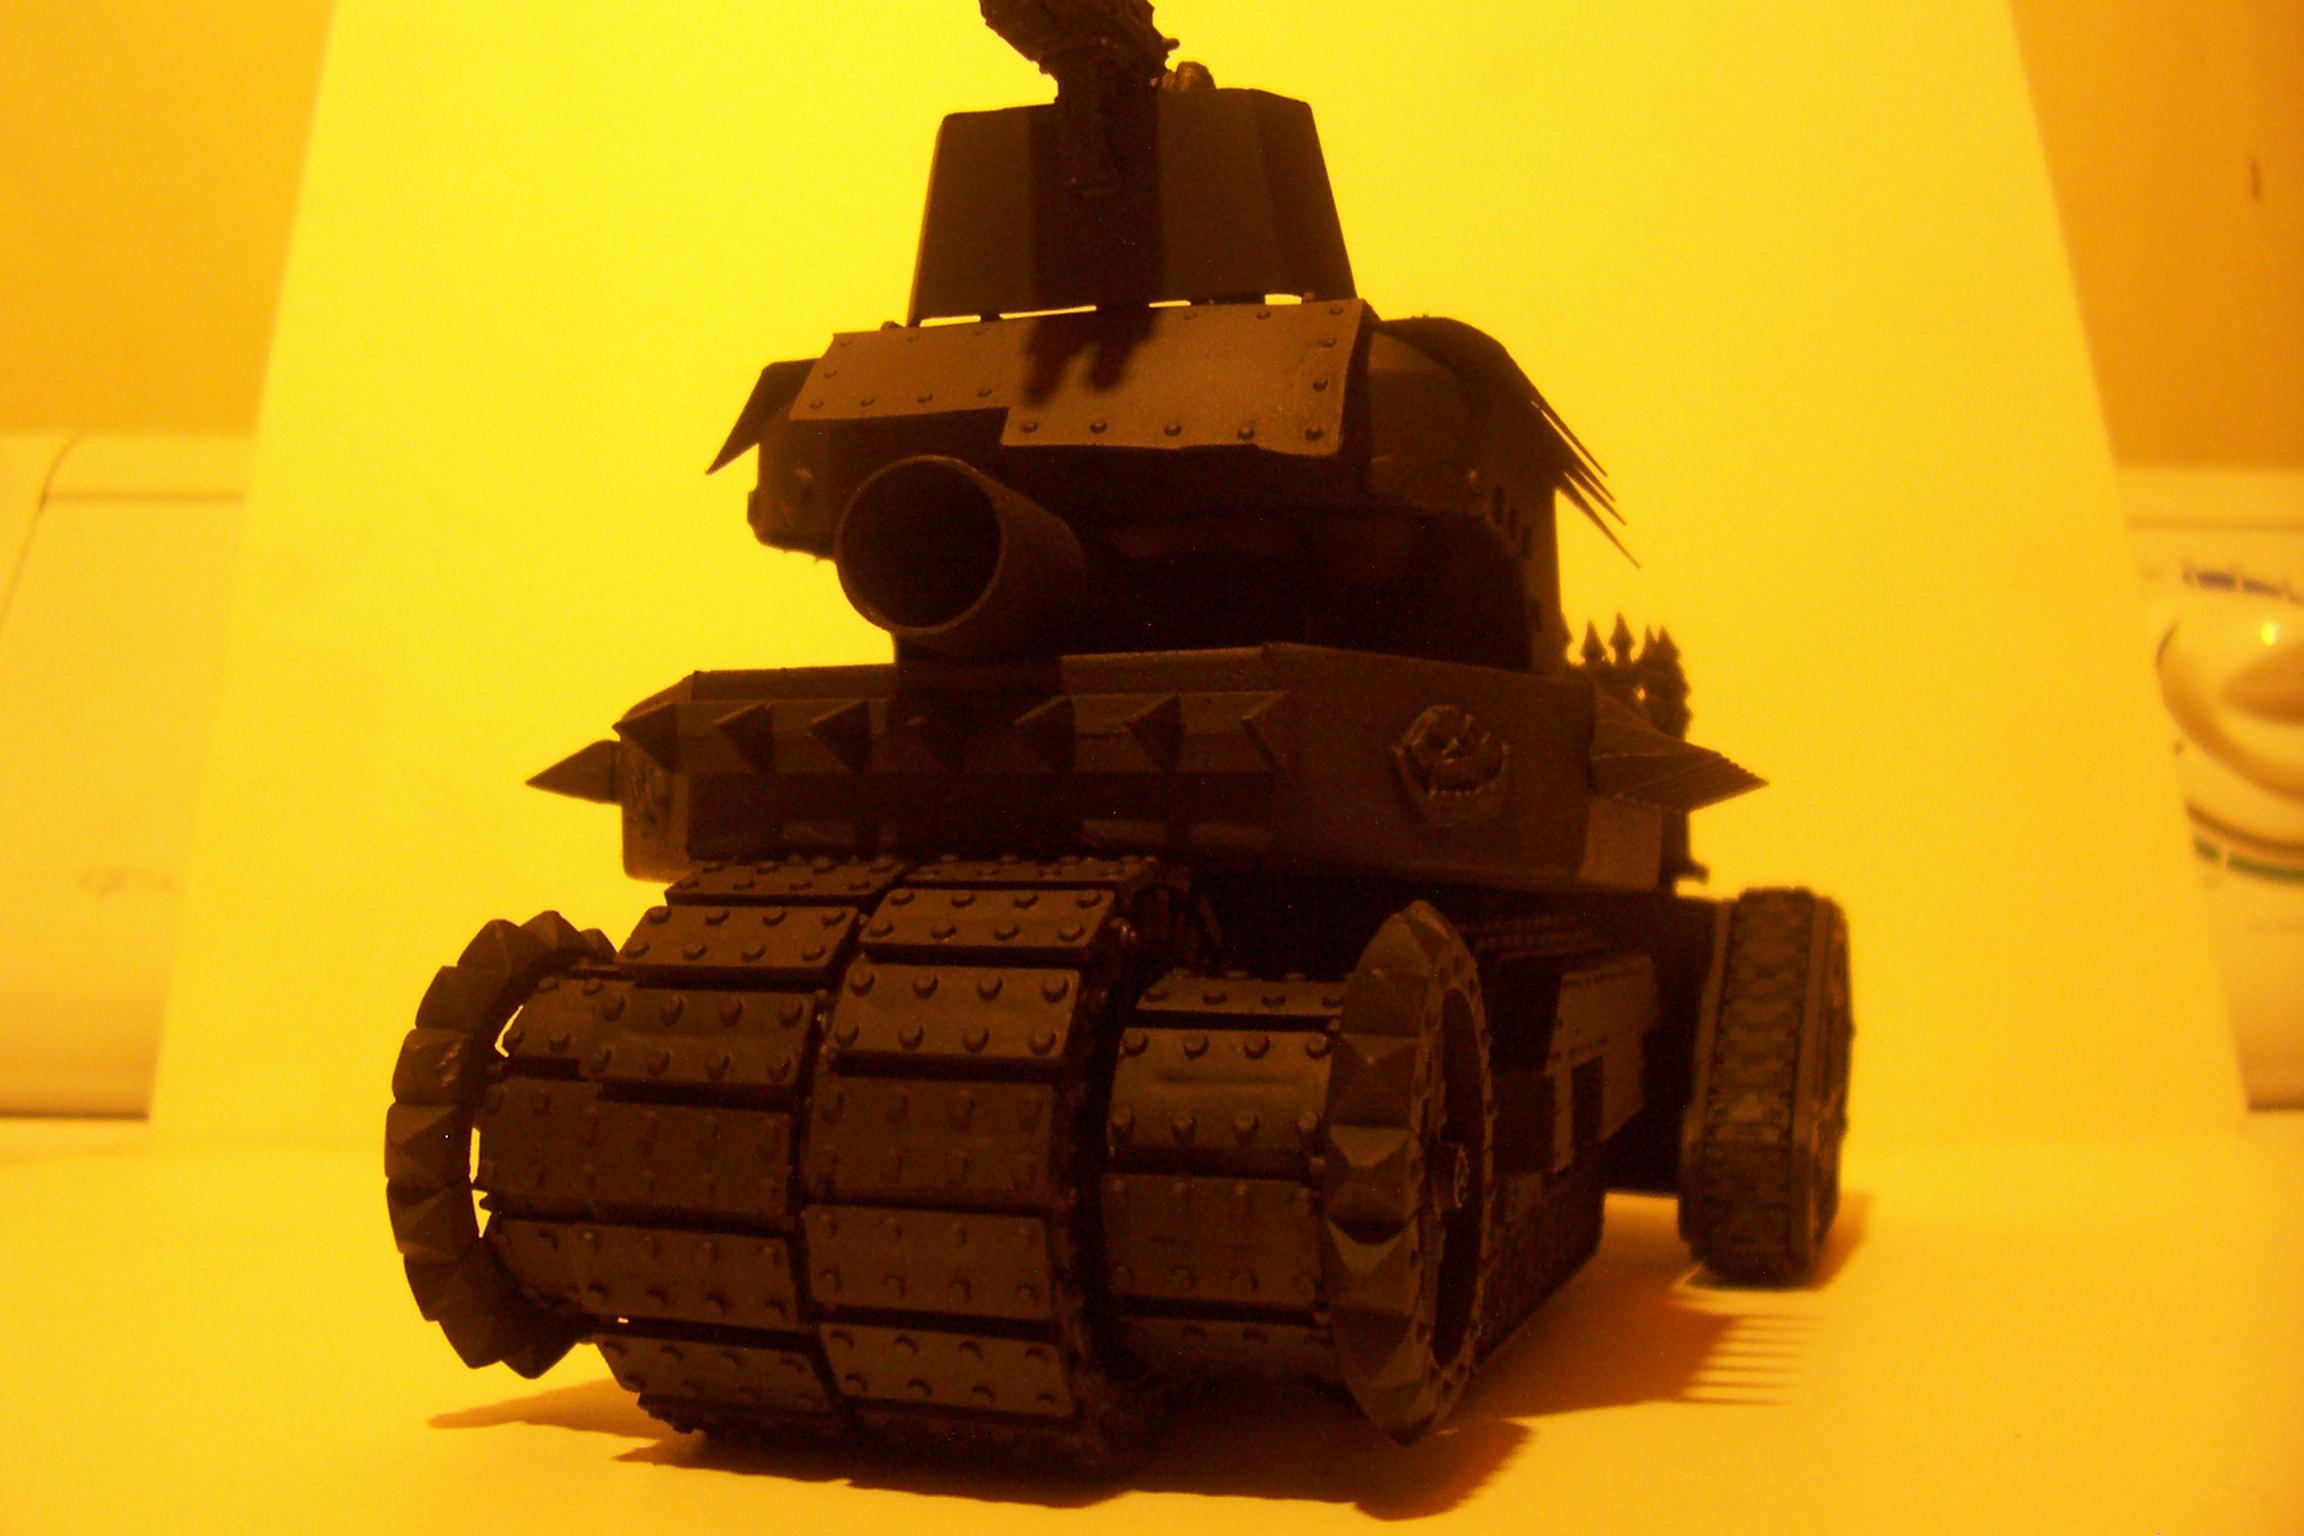 Battlewagon, Conversion, Leman Russ, Looted, Orks, Primered, Tank, Vehicle